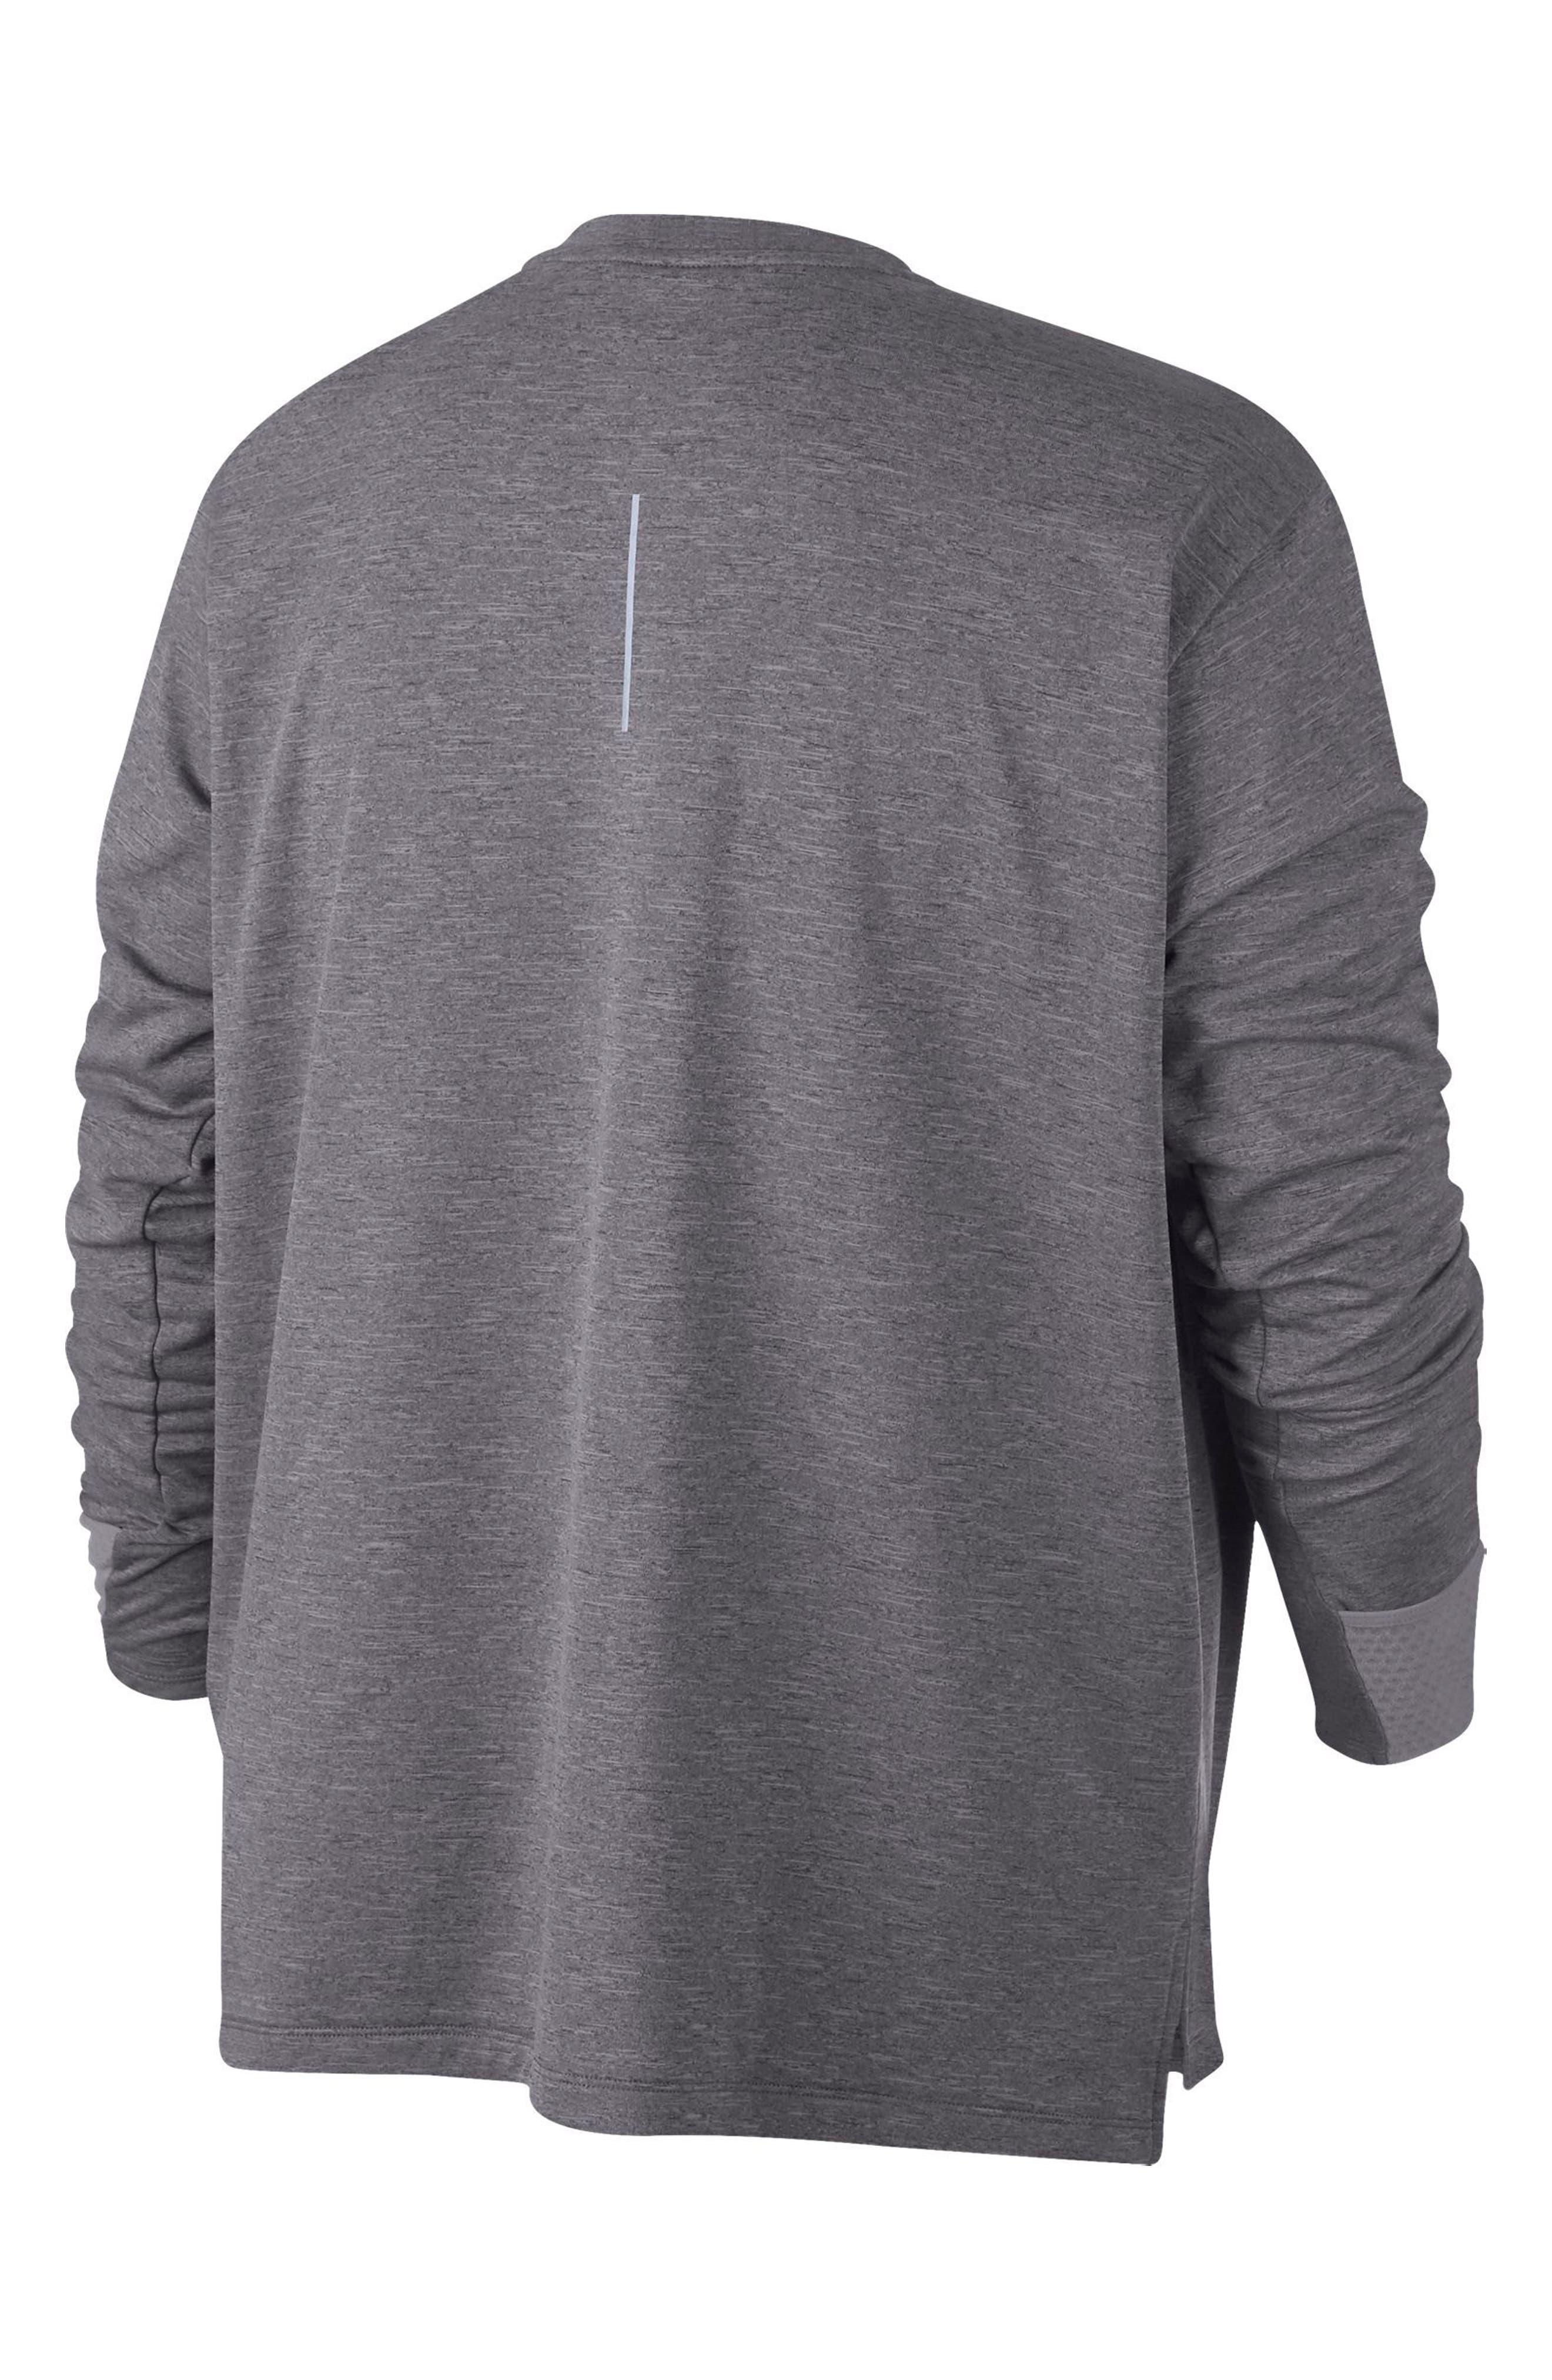 Therma Sphere Element Running Shirt,                             Alternate thumbnail 8, color,                             GUNSMOKE/ HEATHER